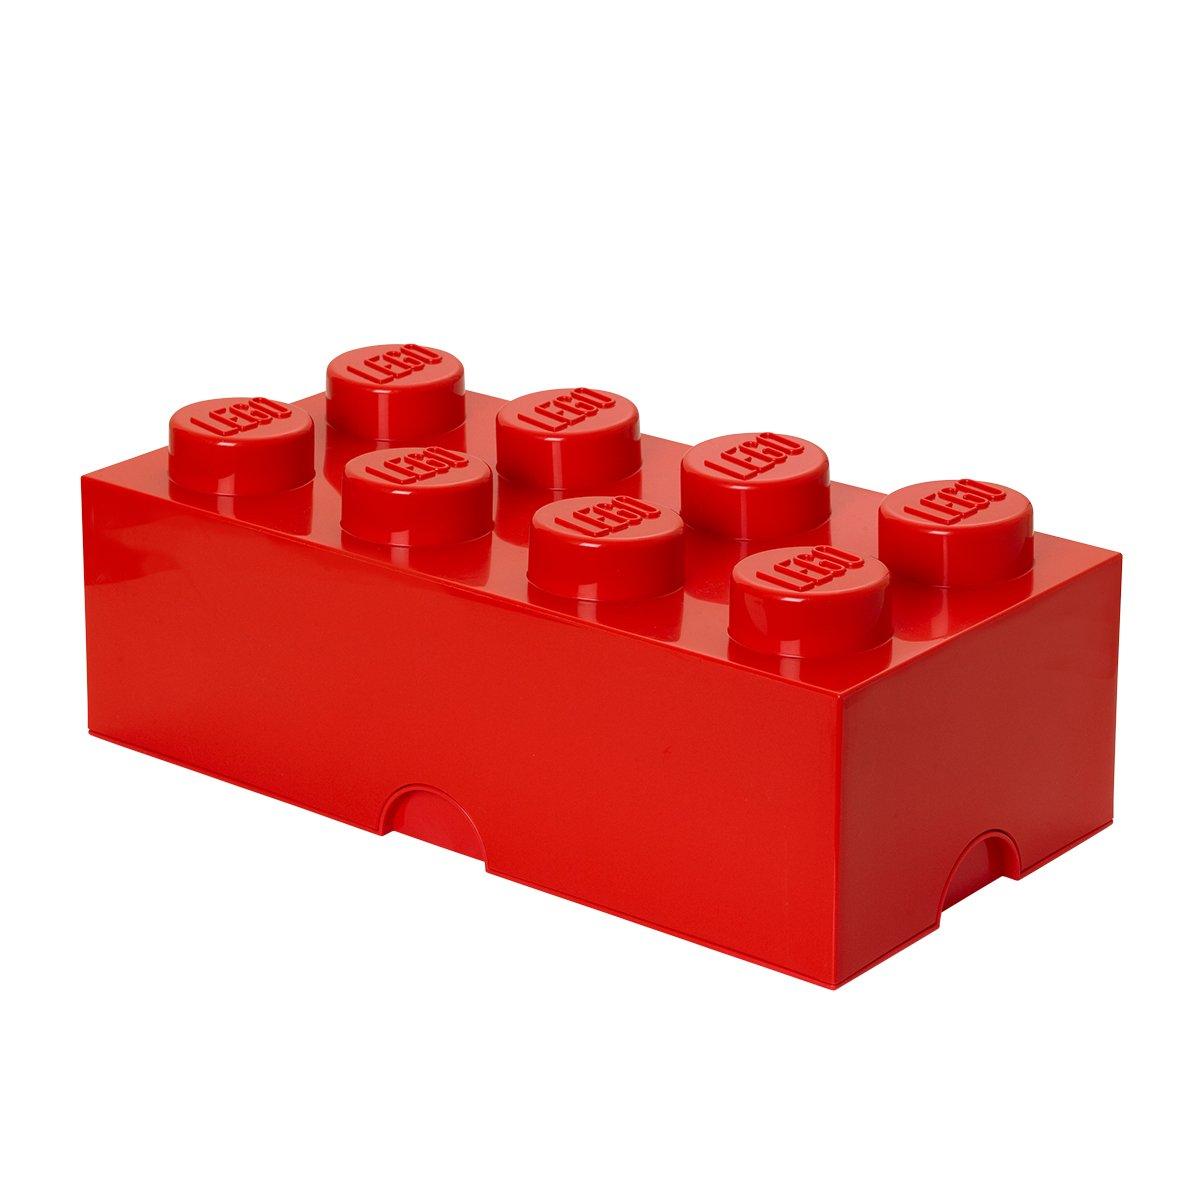 LEGO - Scatola stoccaggio, Rosa, Lego Italy 5706773400492